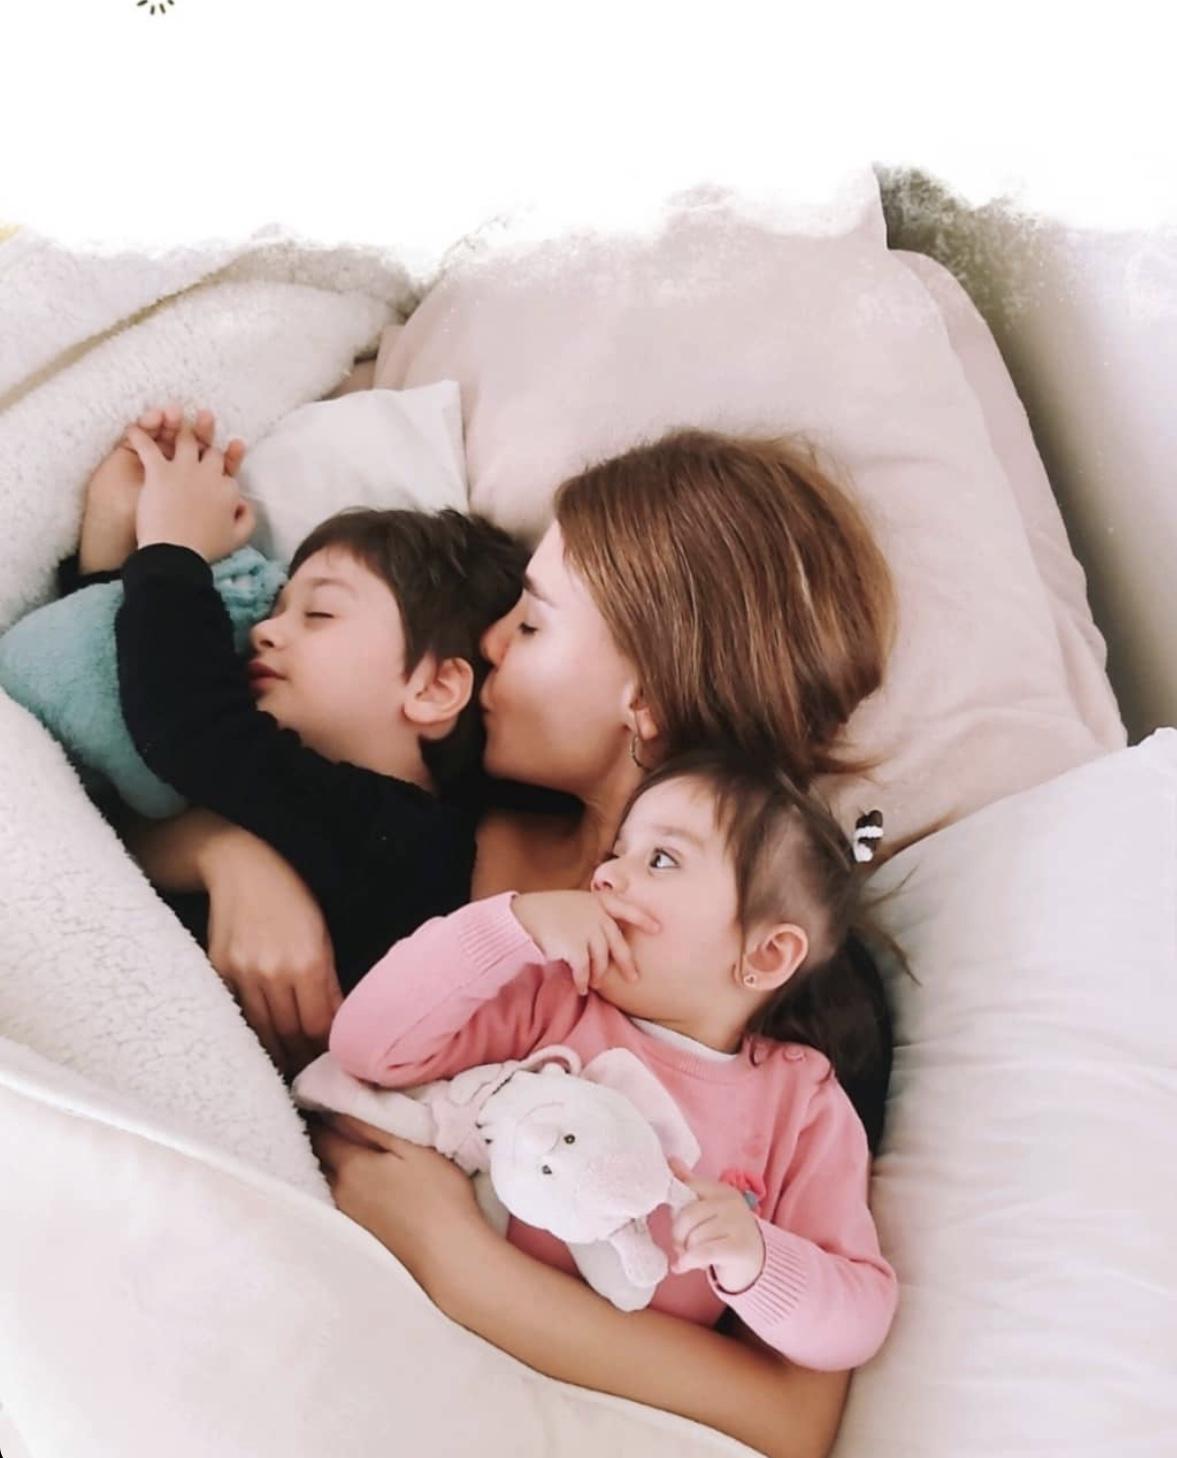 داليدا عياش نائمة بين طفليها